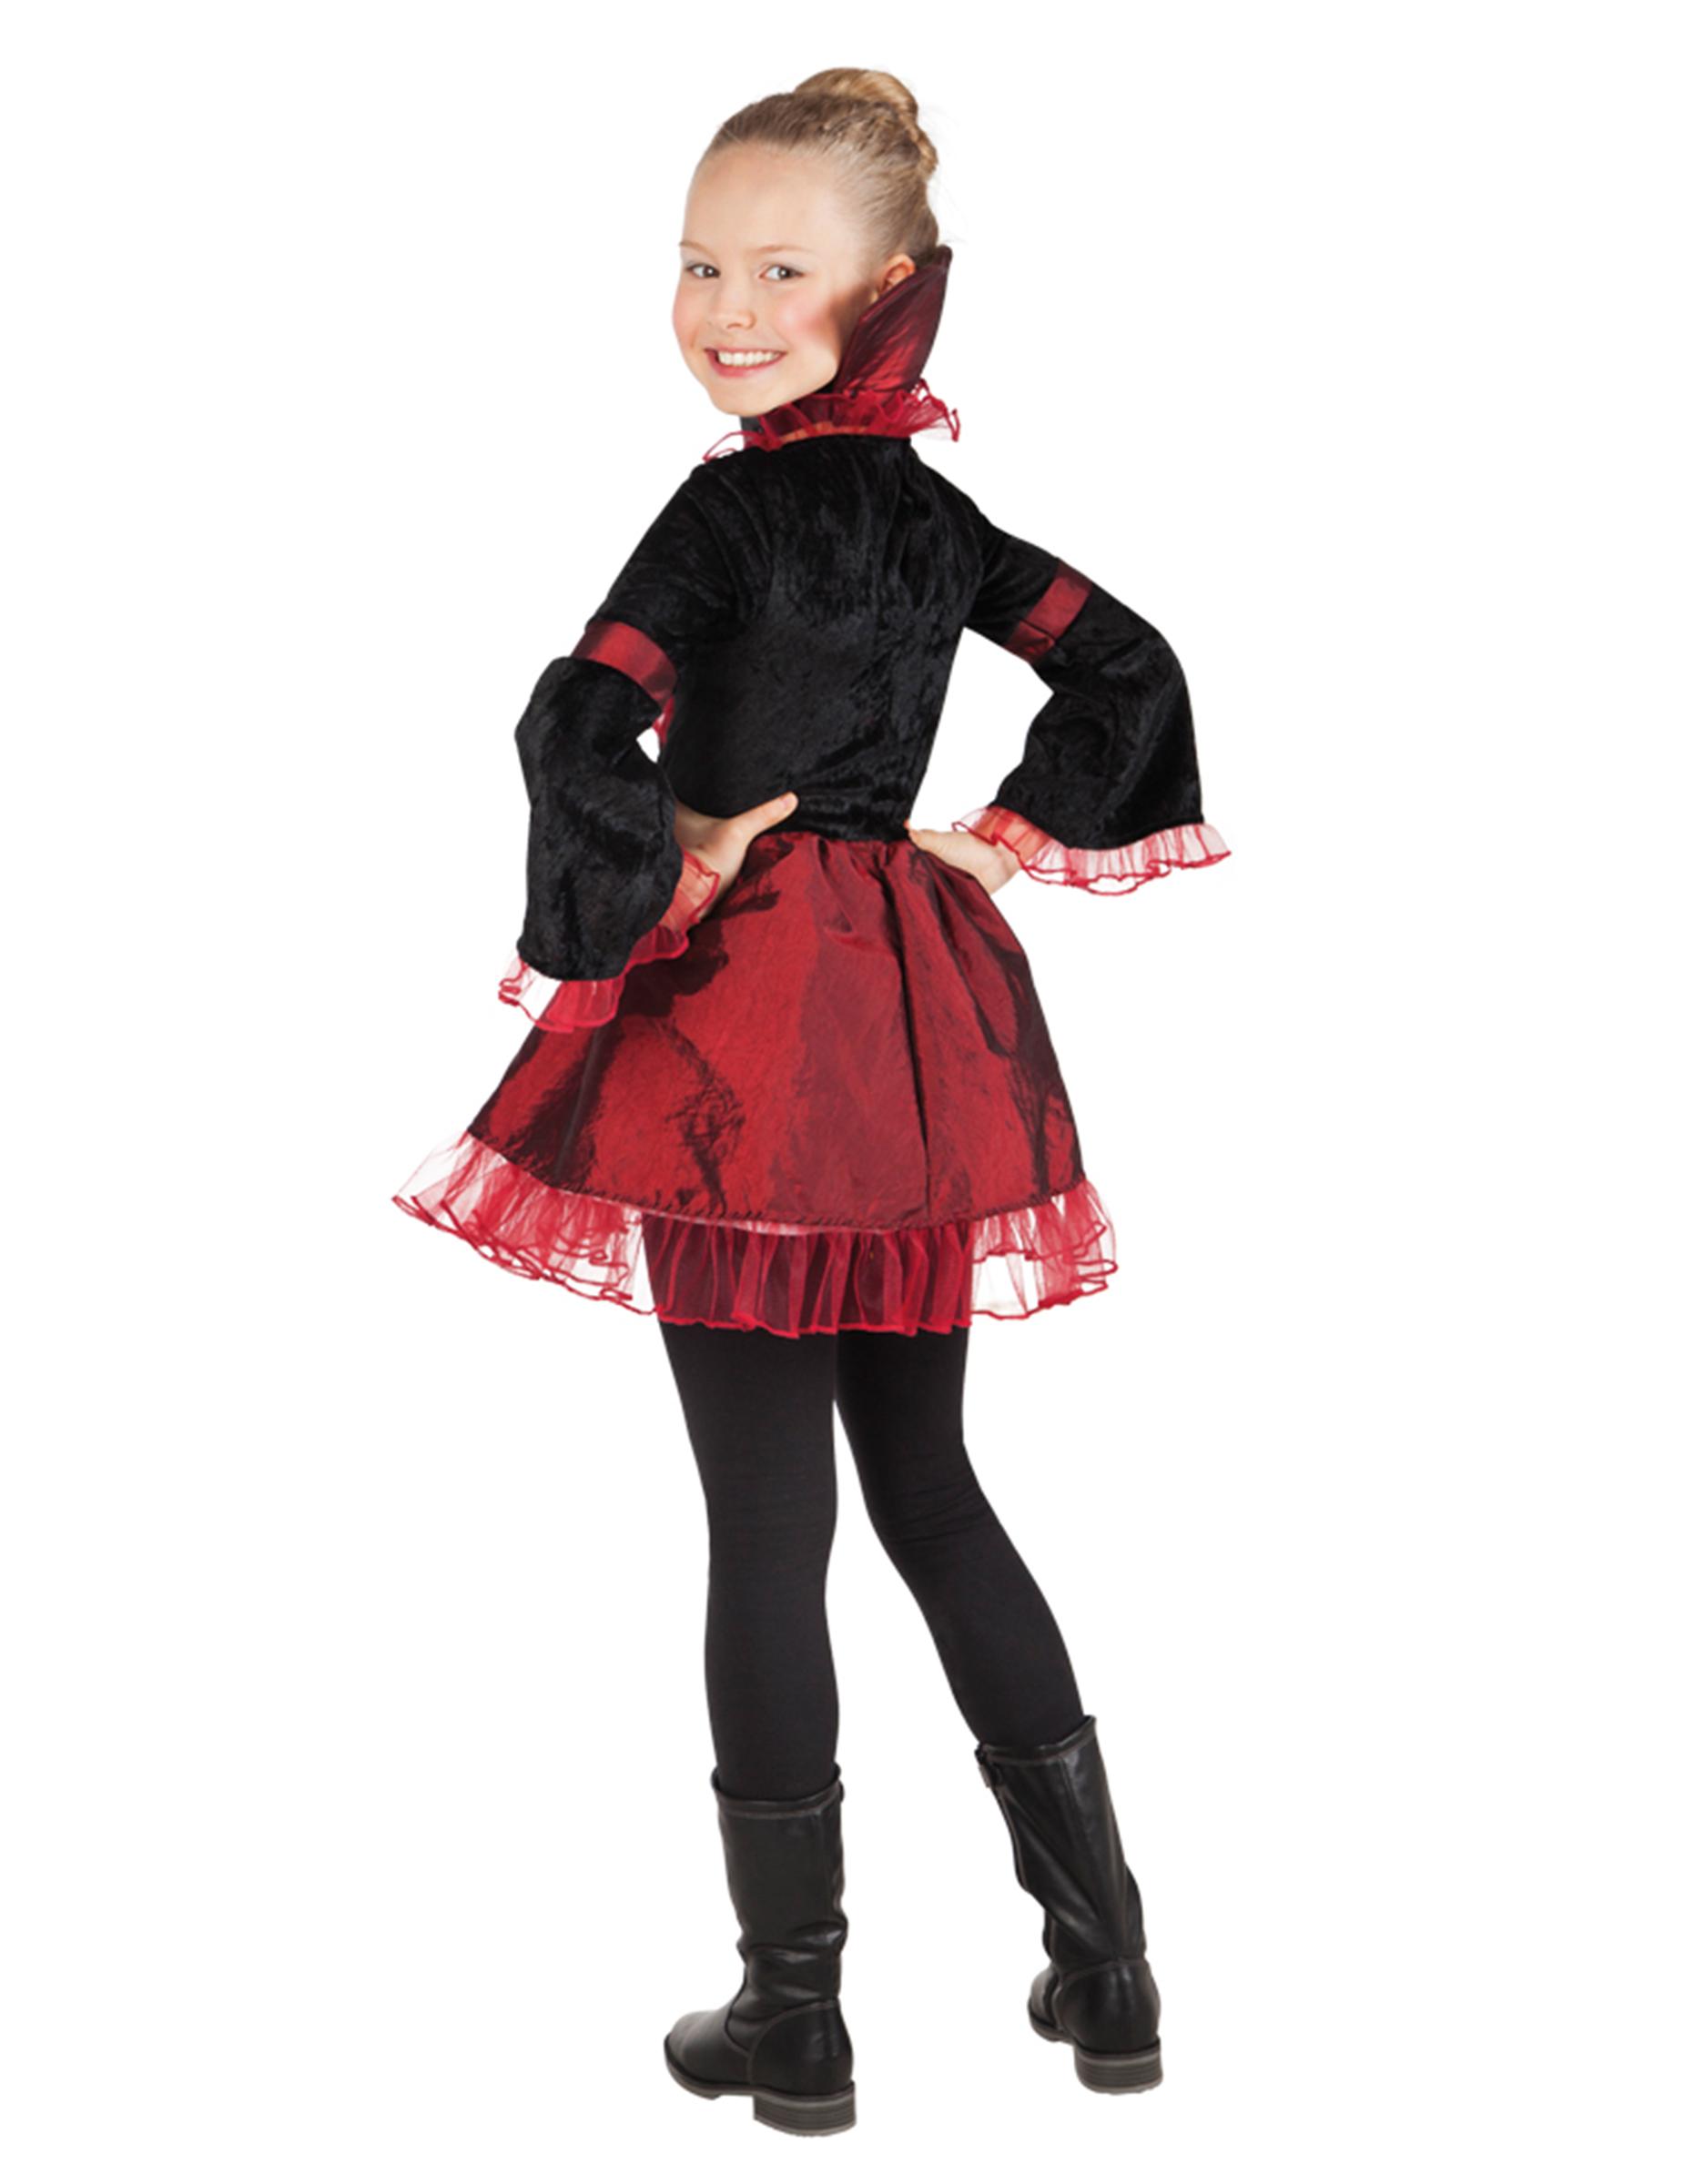 Costume imperatrice vampiro per bambina Halloween su VegaooParty ... 130f258a9b85